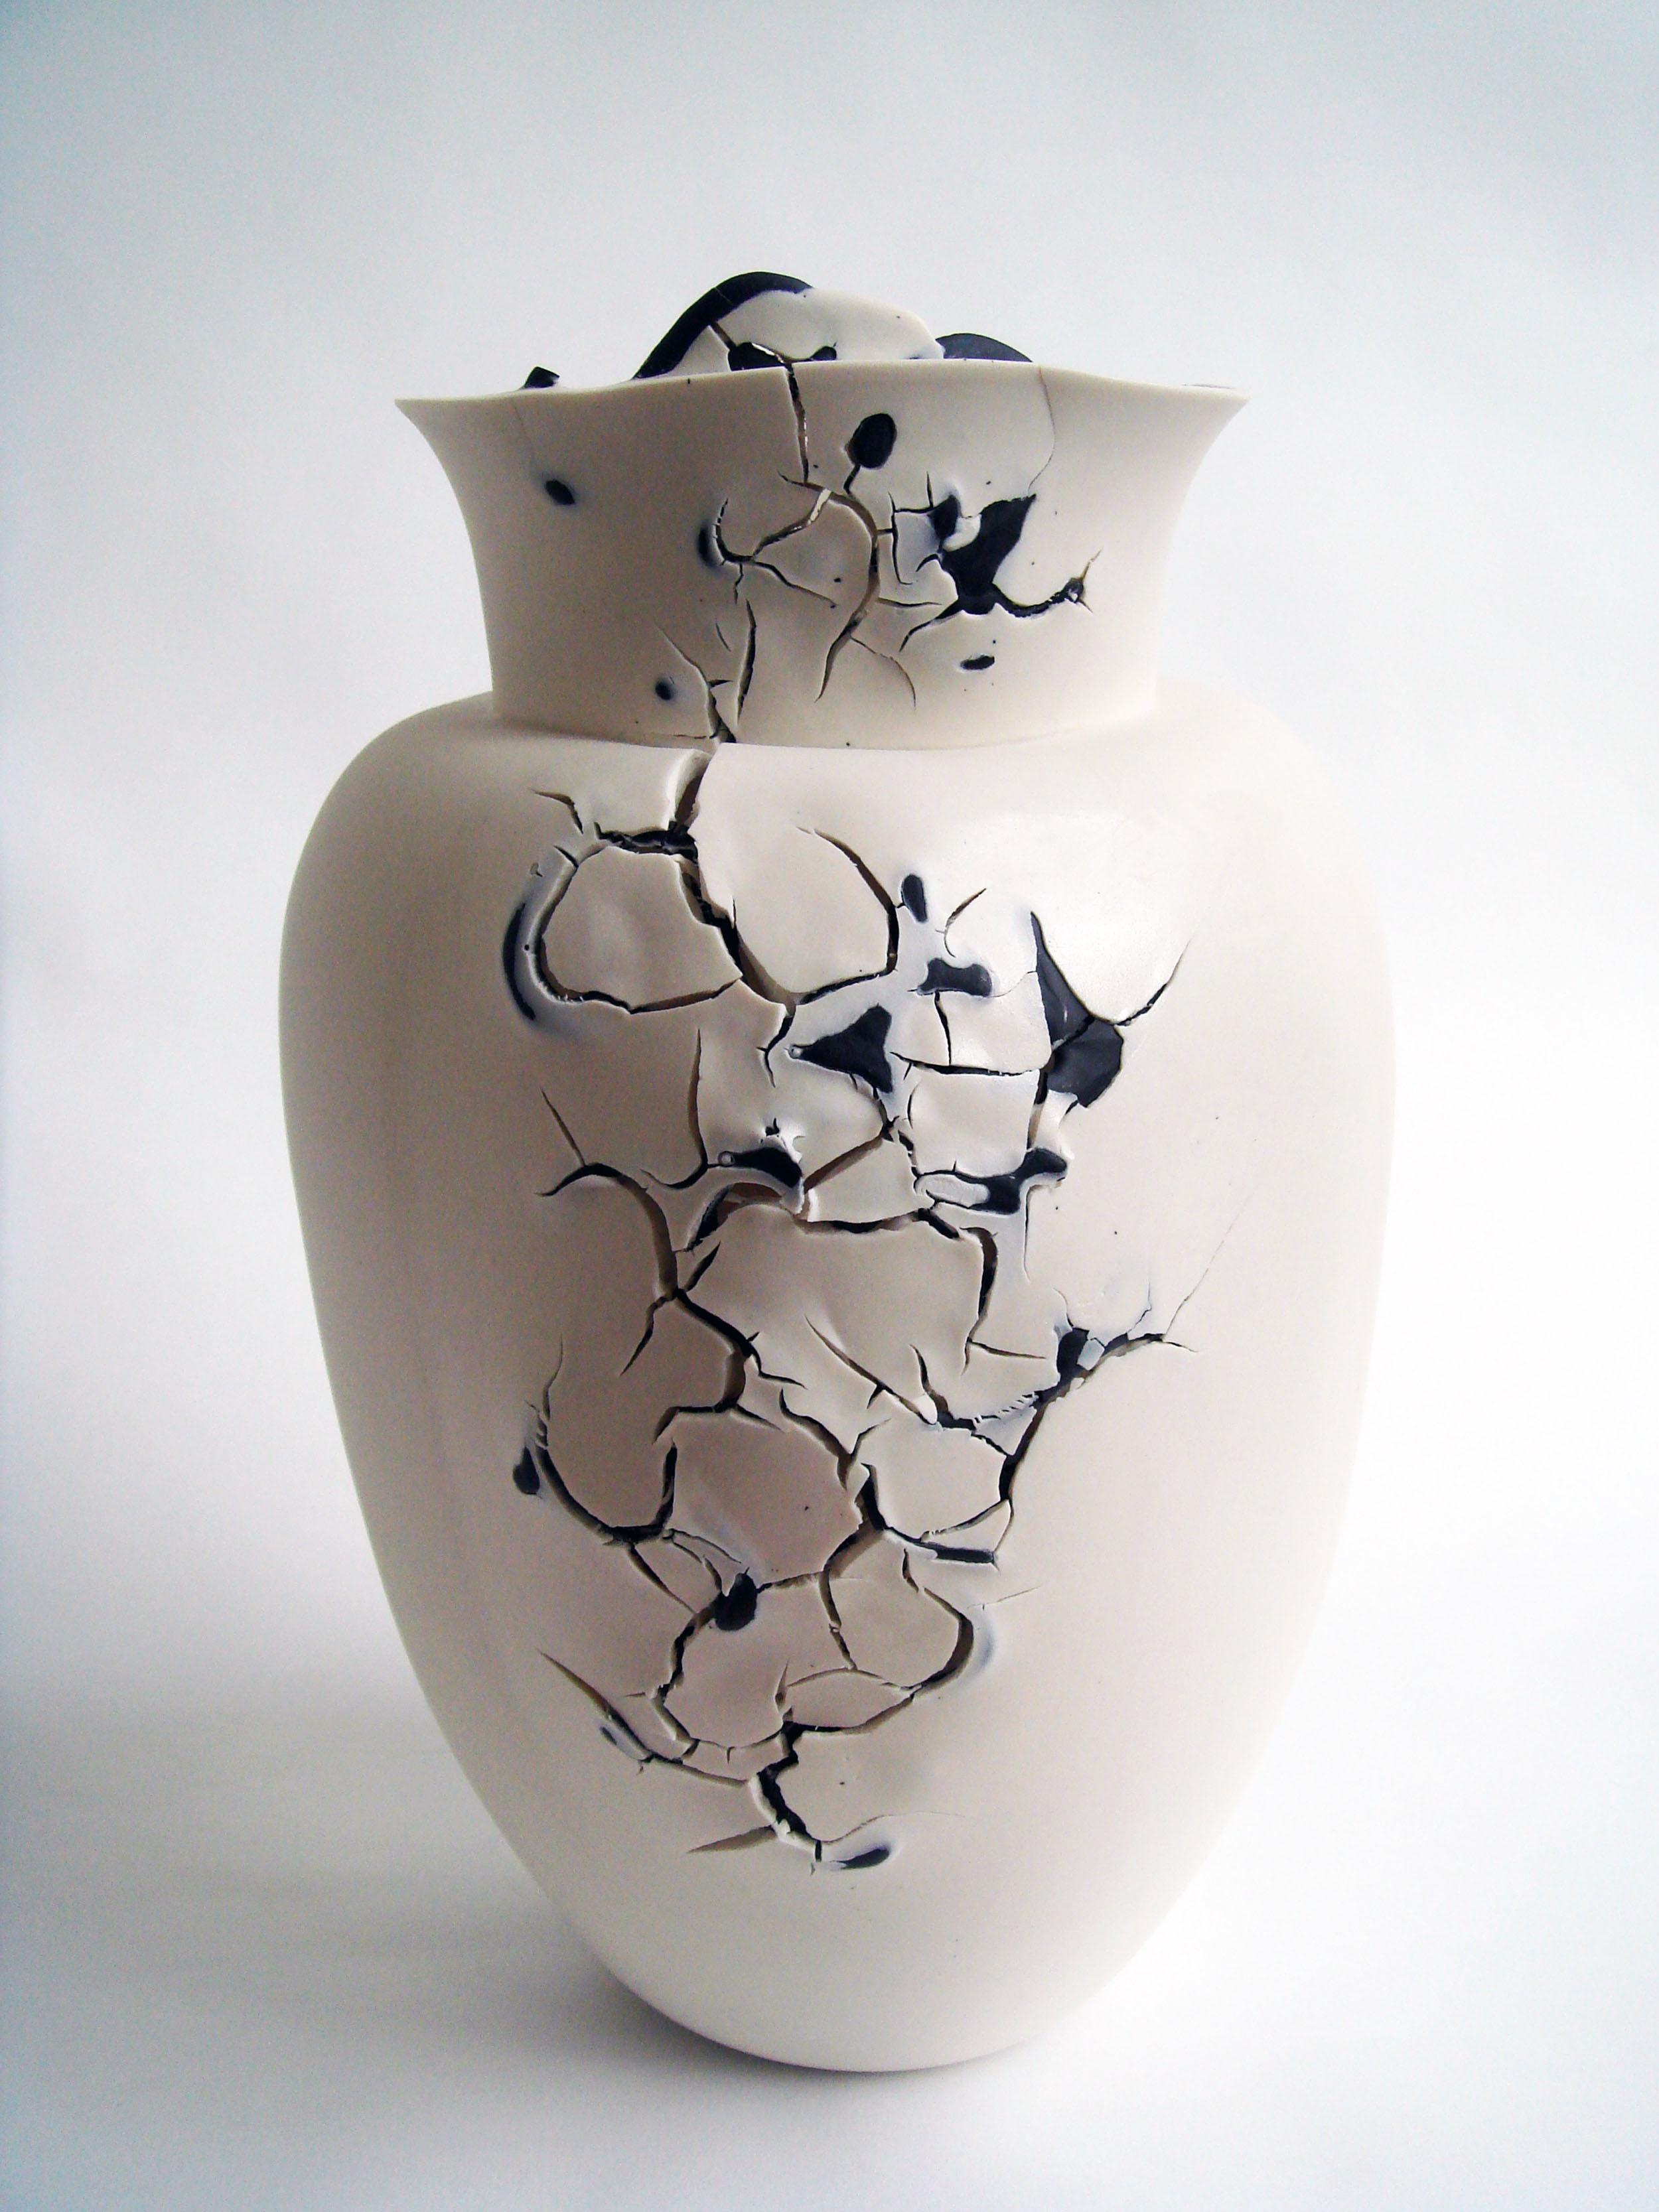 Datovania van úsvik keramiky